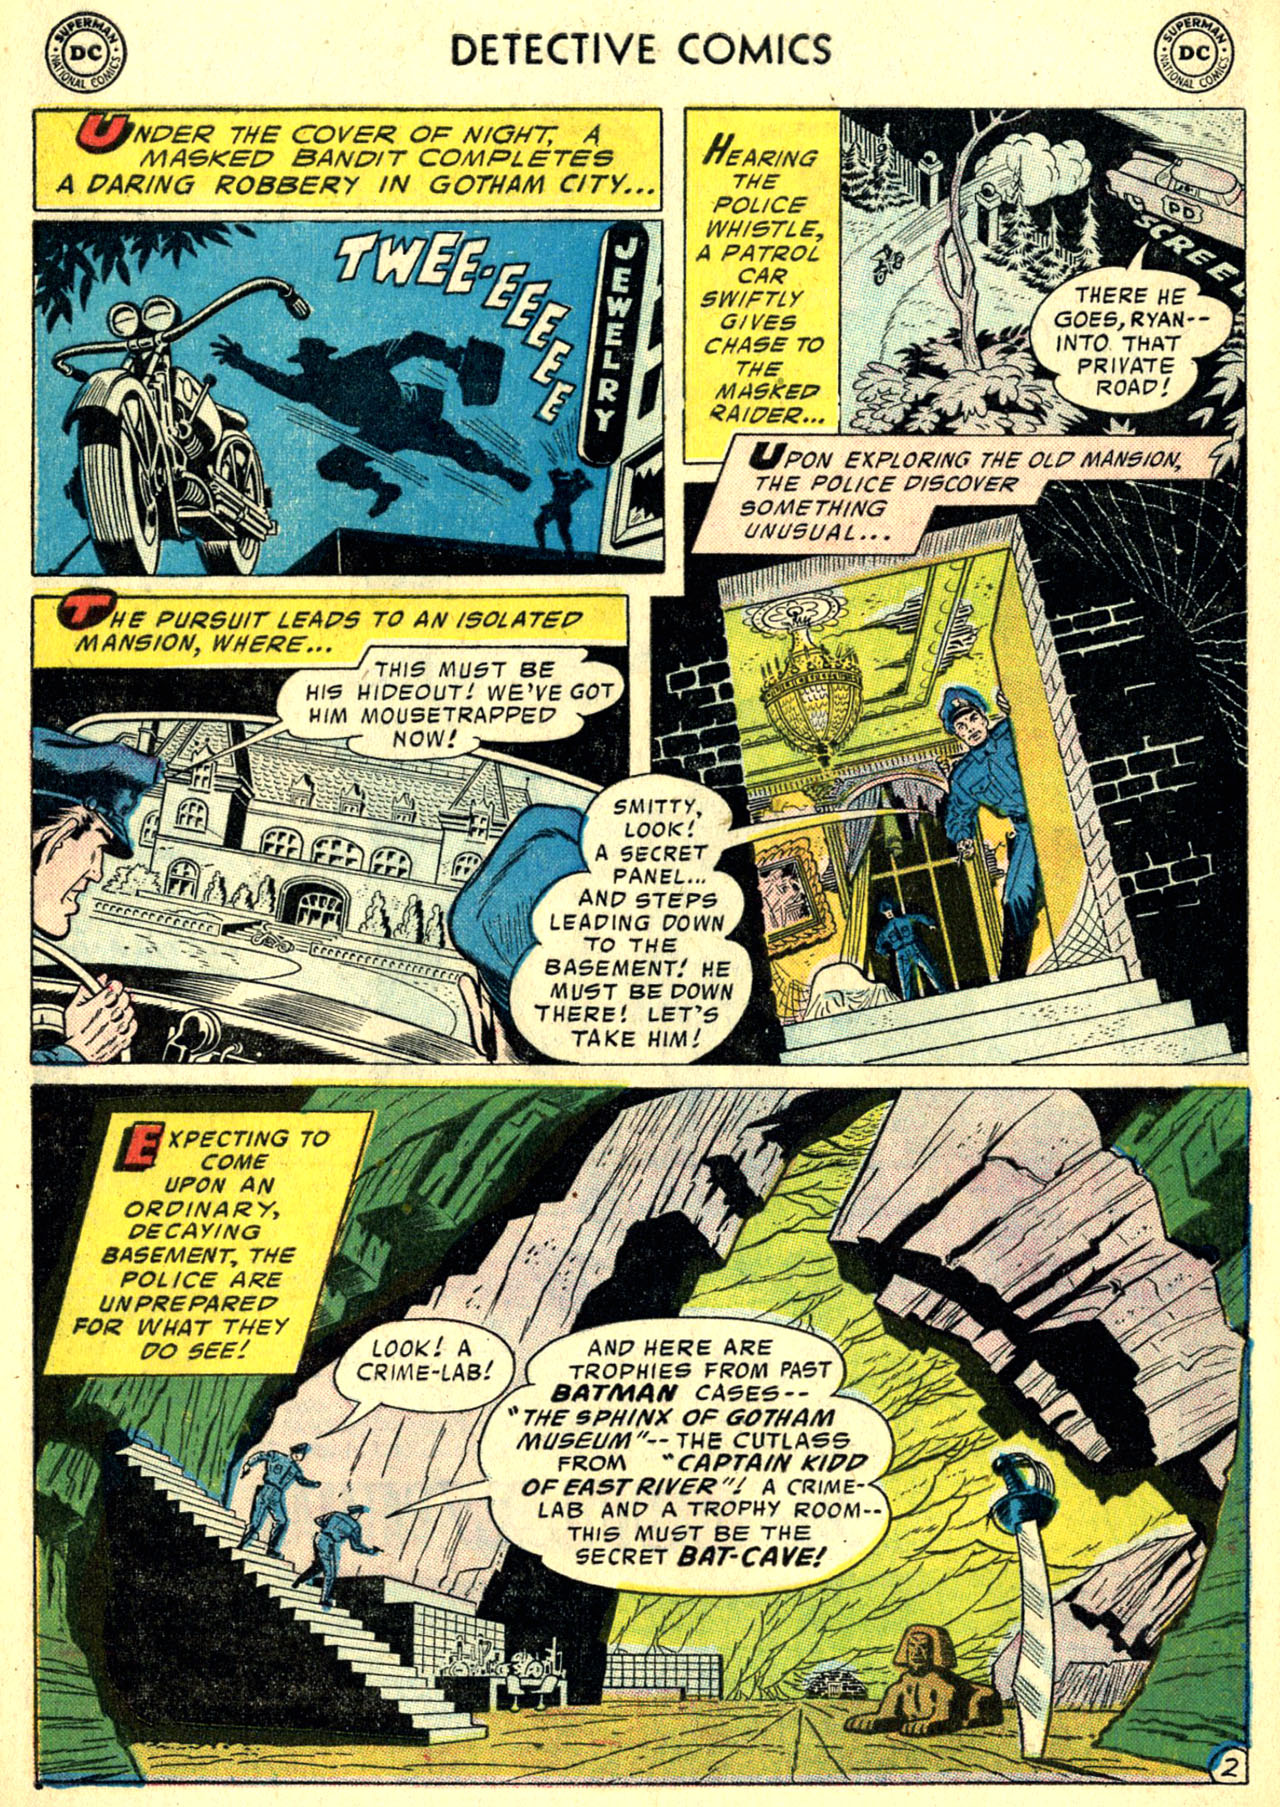 Detective Comics (1937) 240 Page 3